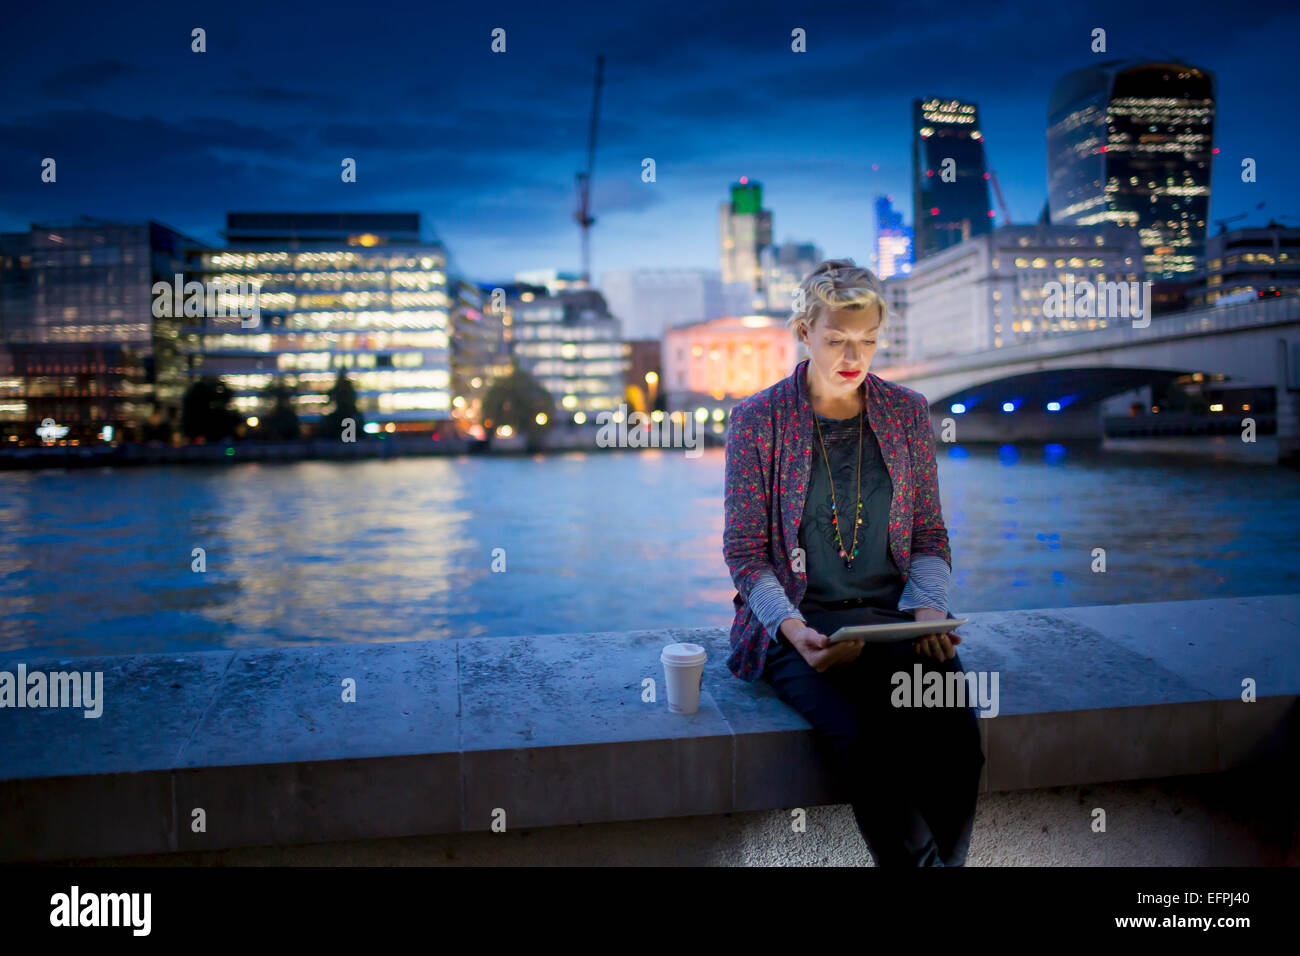 Mature businesswoman sitting on Thames waterfront using digital tablet at night, London, UK - Stock Image